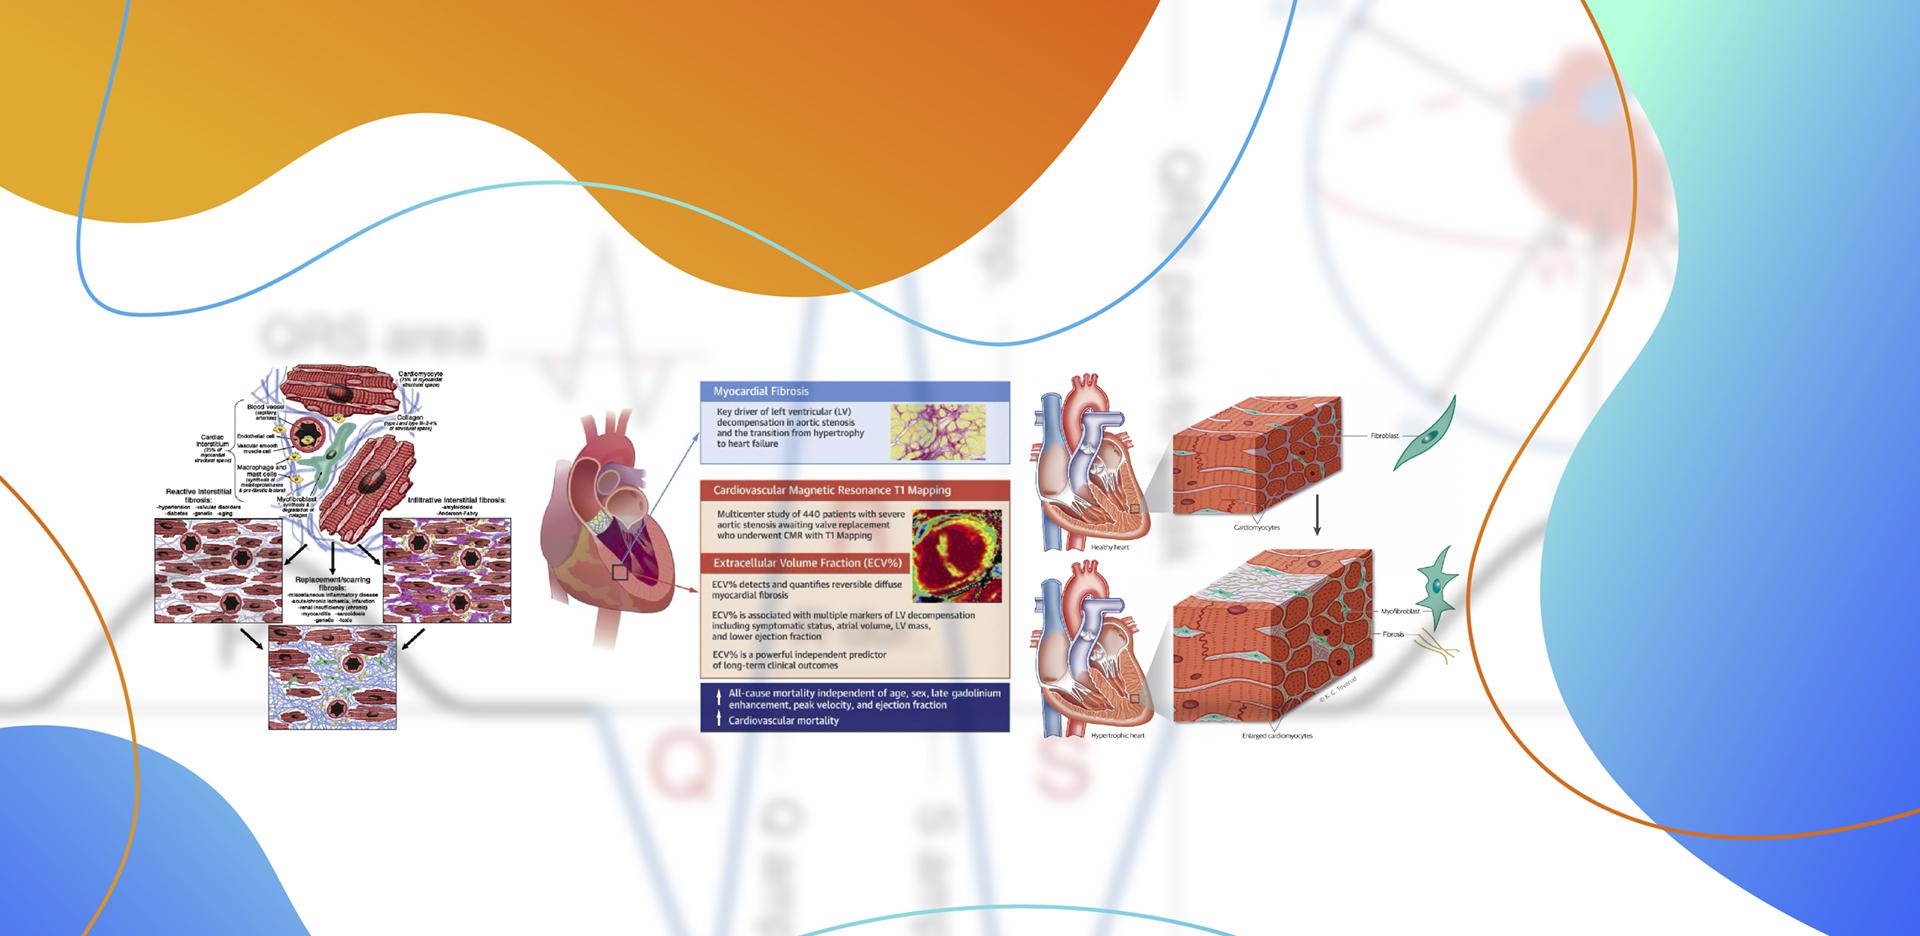 Eletrocardiograma e TAVR